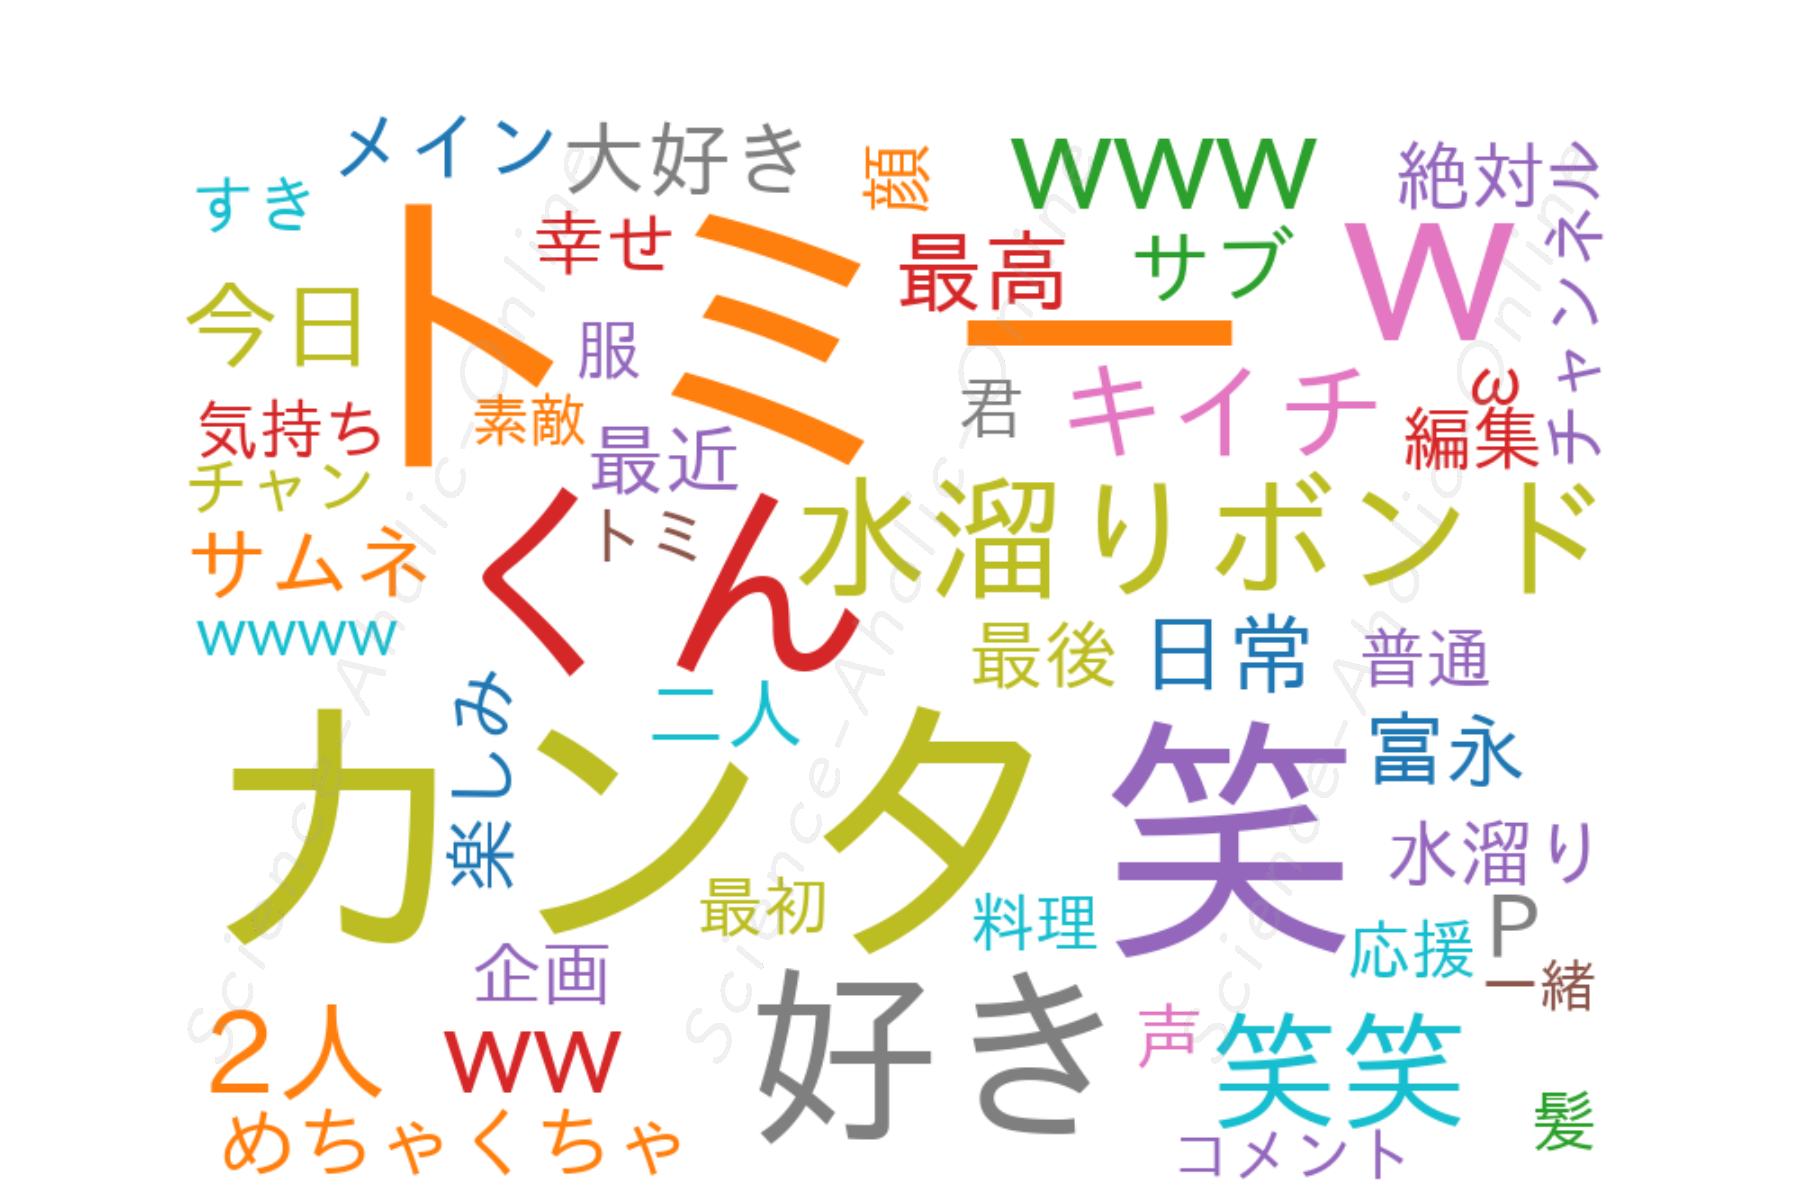 wordcloud_水溜りボンドの日常